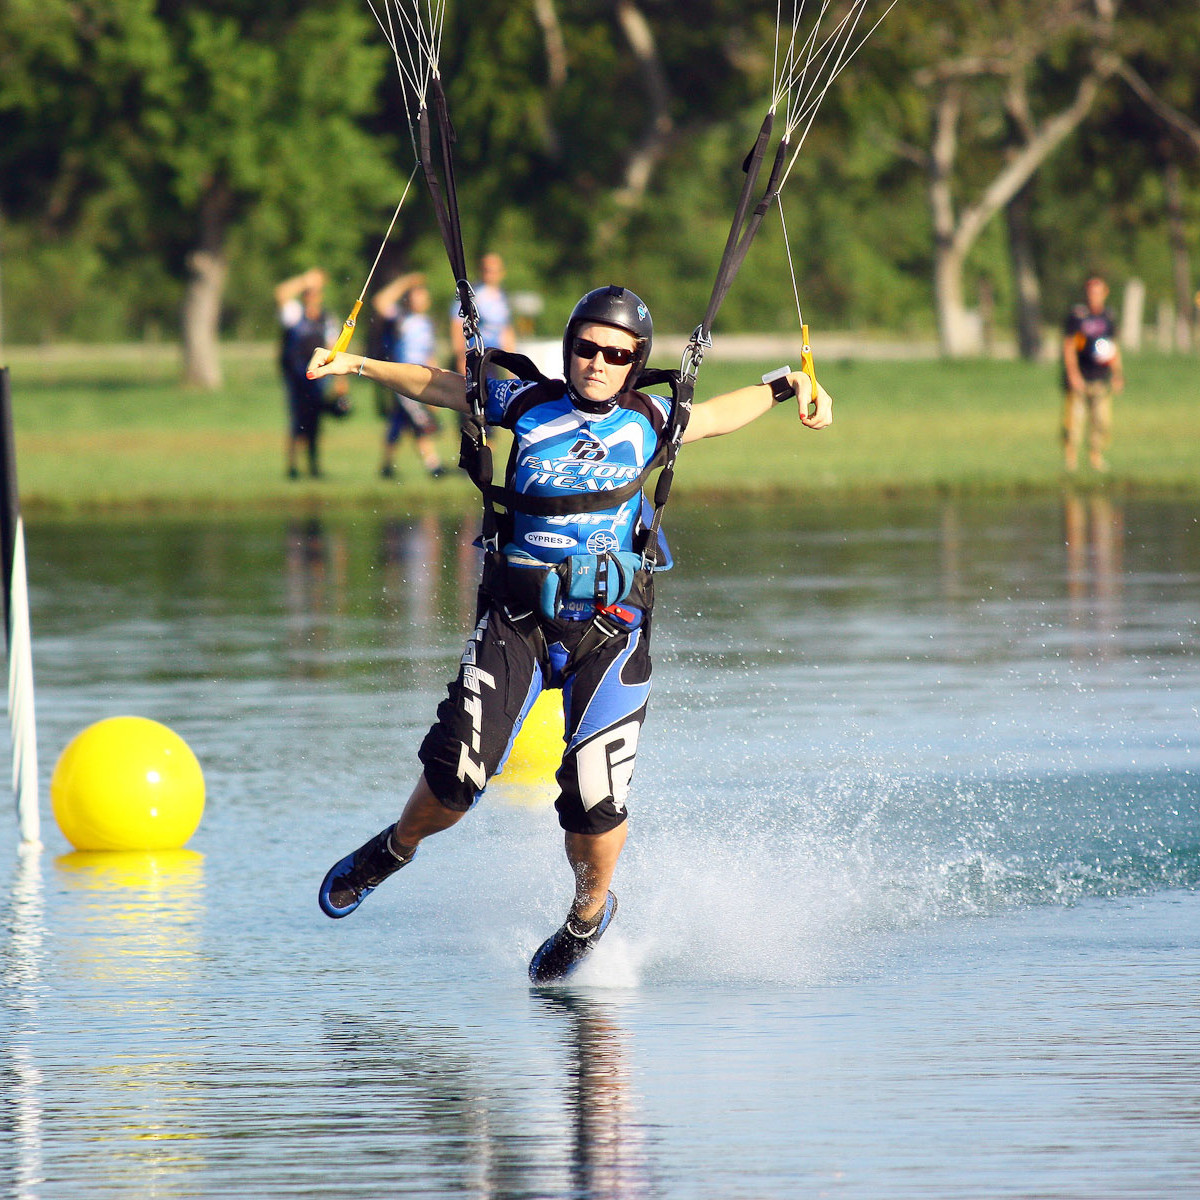 News_skydiving_ Jessica Edgeington